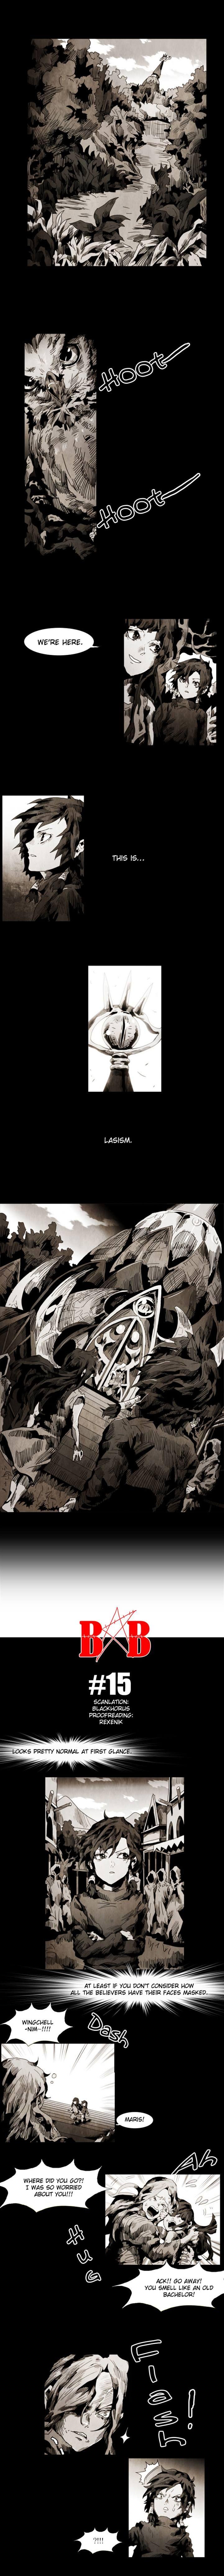 Black Behemoth 15 Page 1